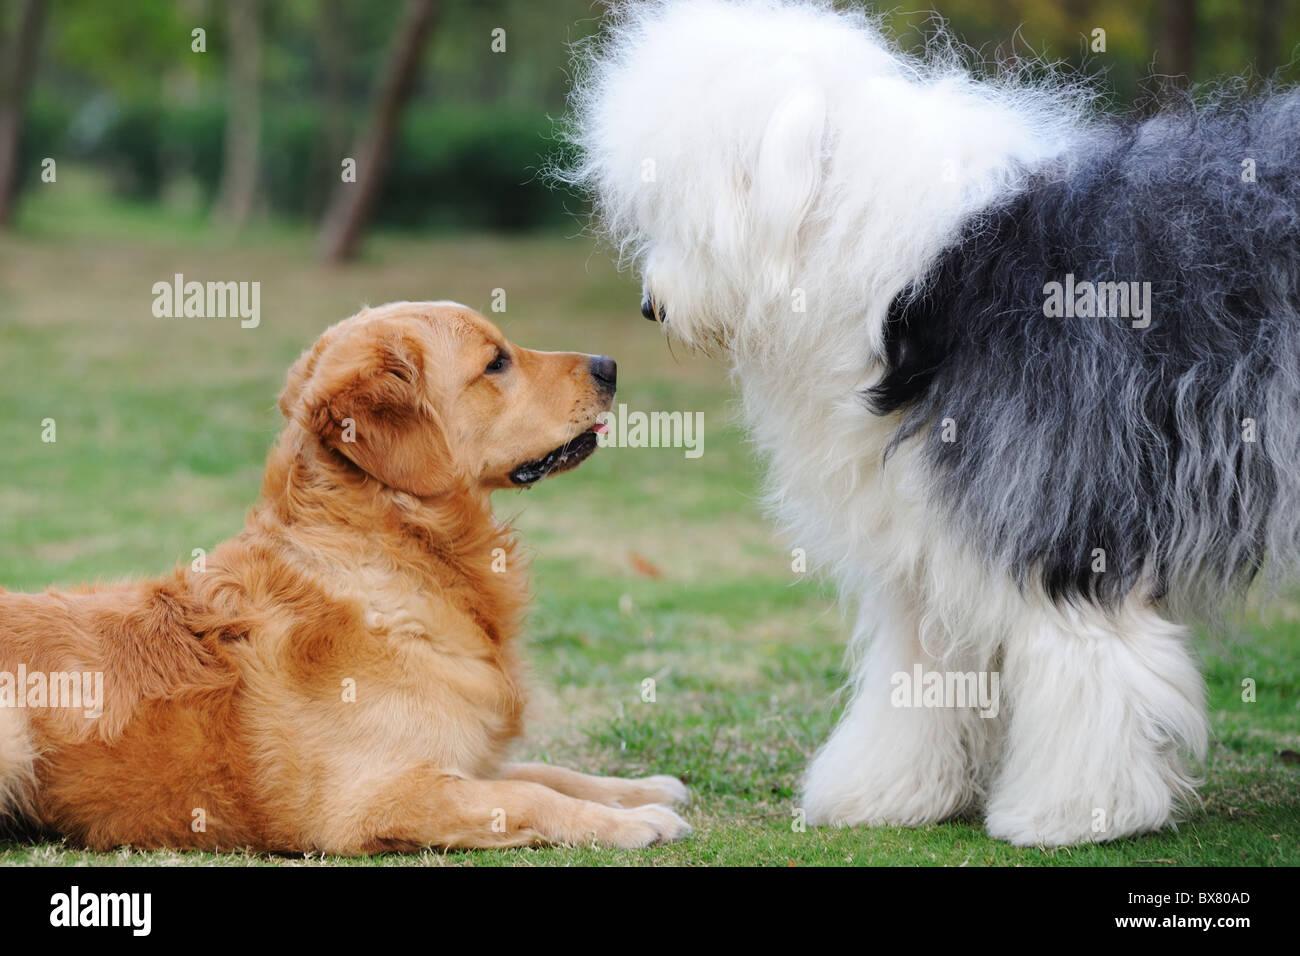 Old English Sheepdog Puppy Stock Photos & Old English